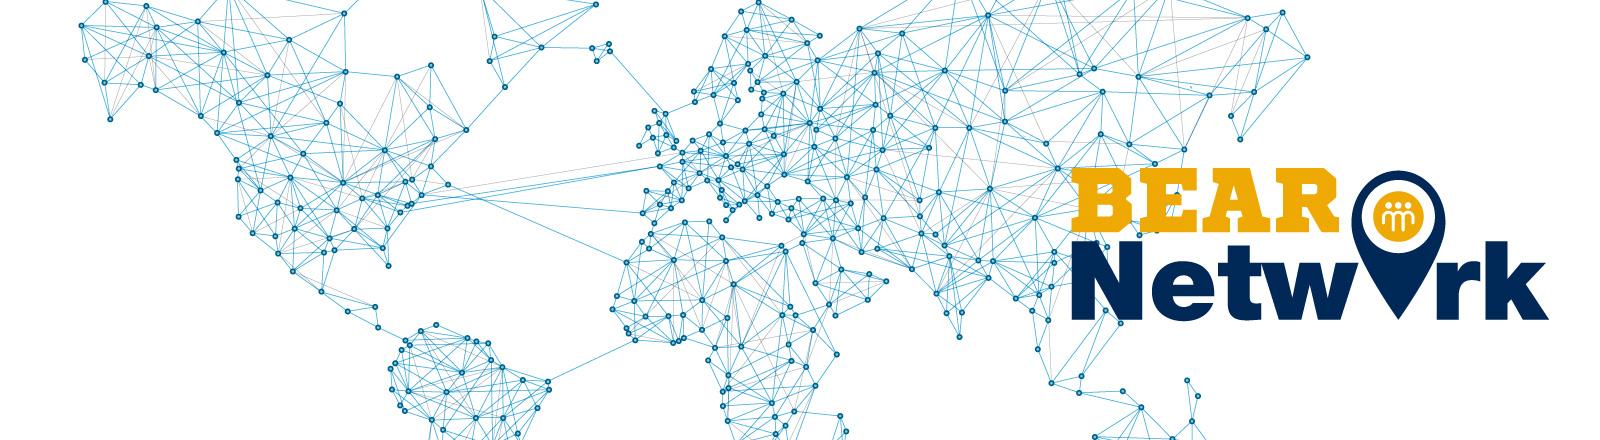 UNC Bear Network